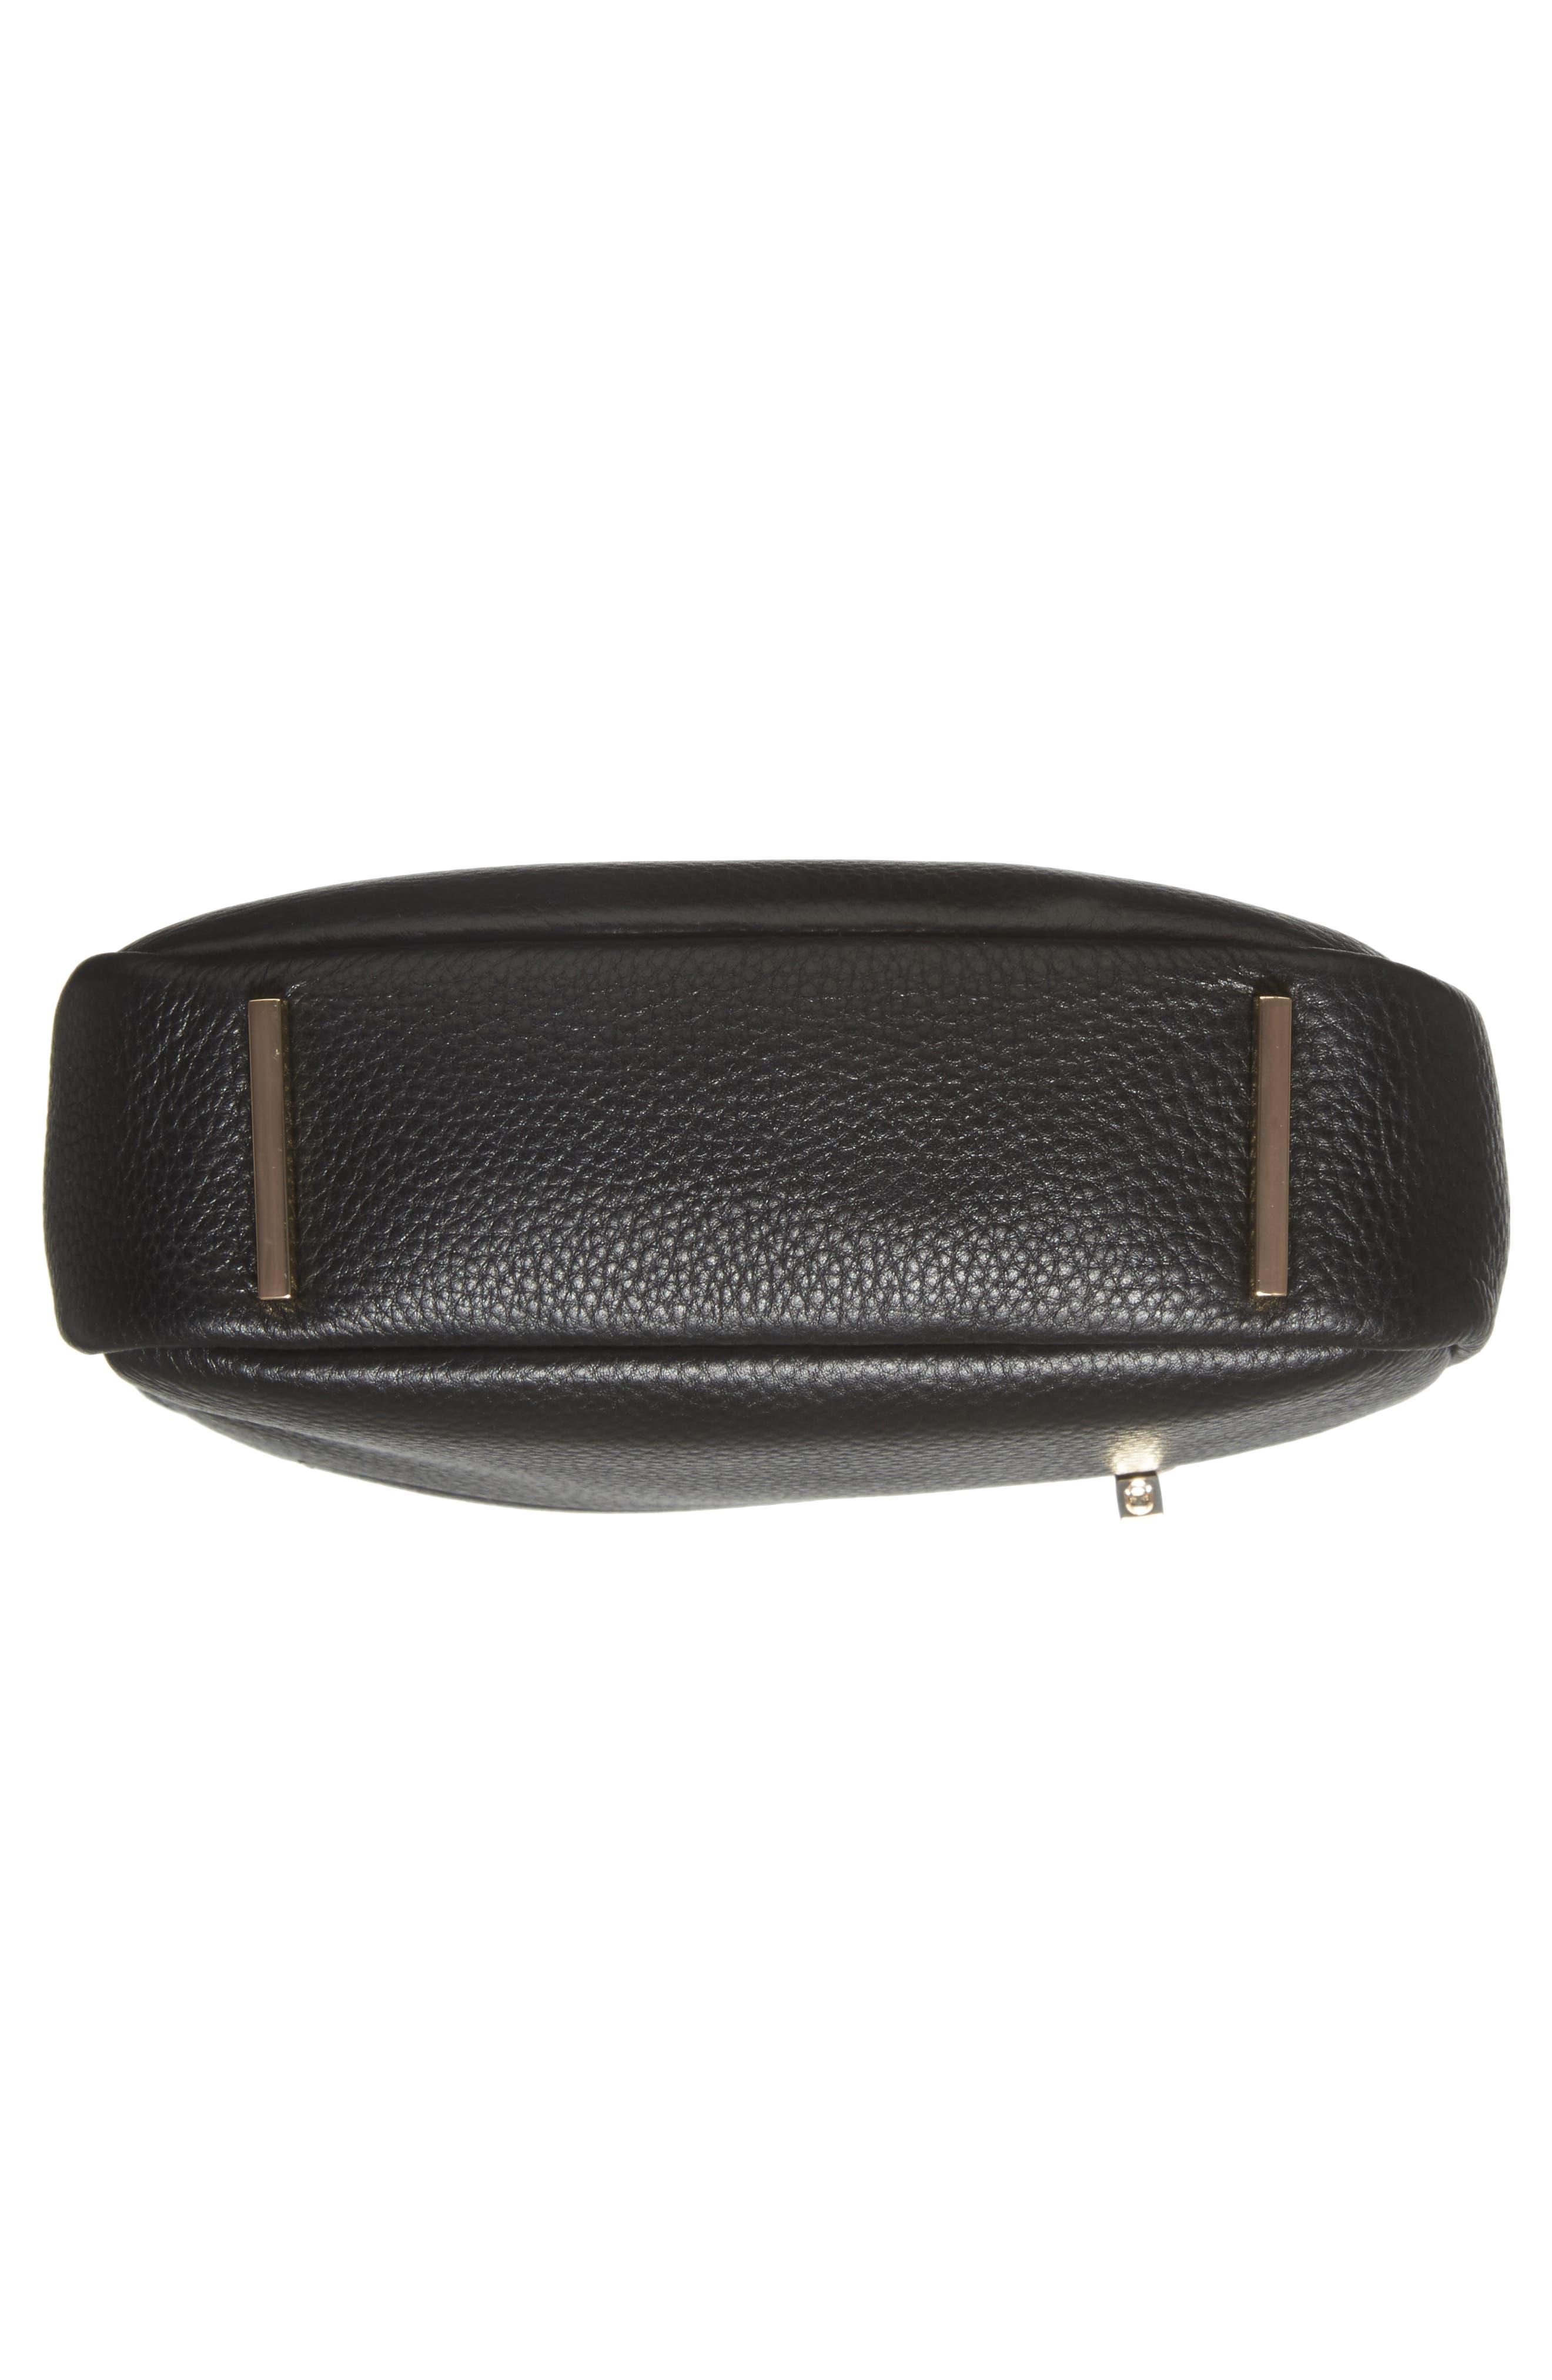 Céline Dion Adagio Leather Camera Crossbody Bag,                             Alternate thumbnail 16, color,